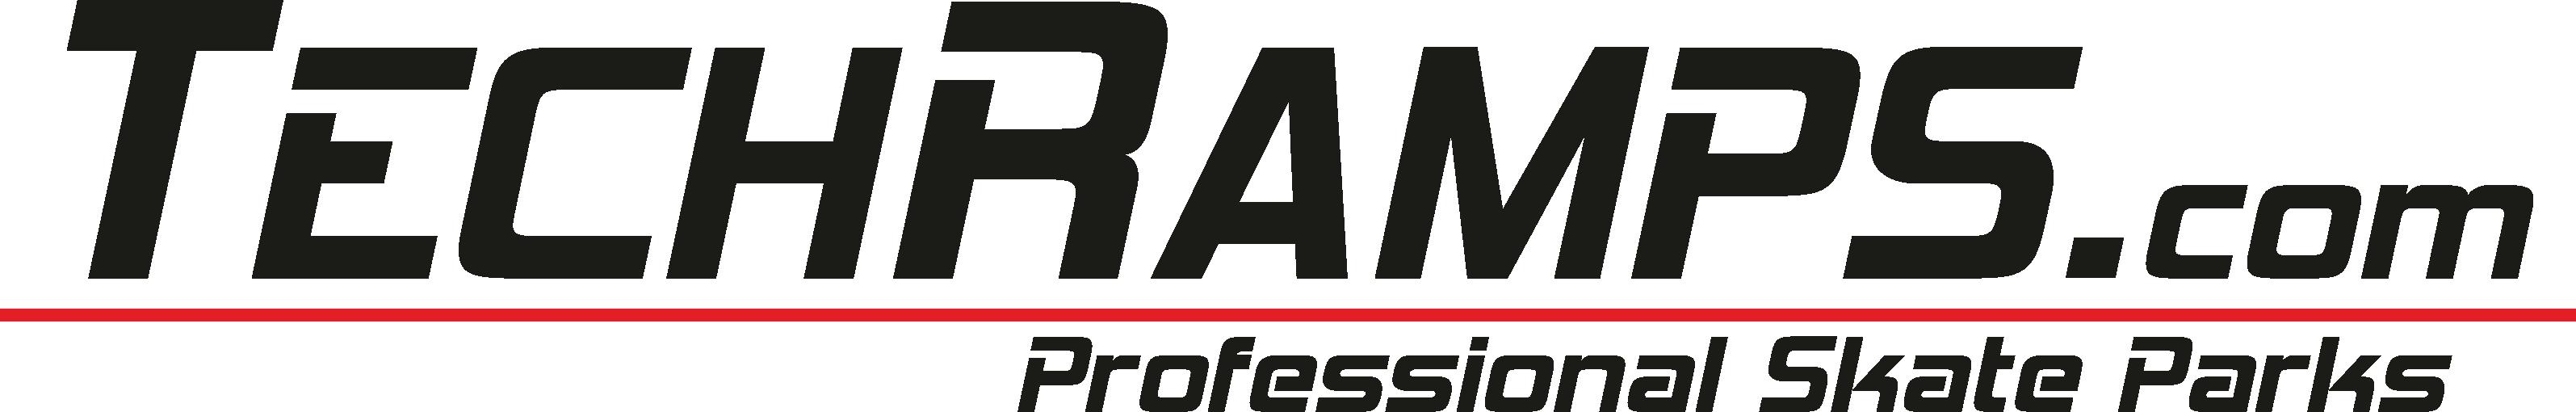 Rixen logo